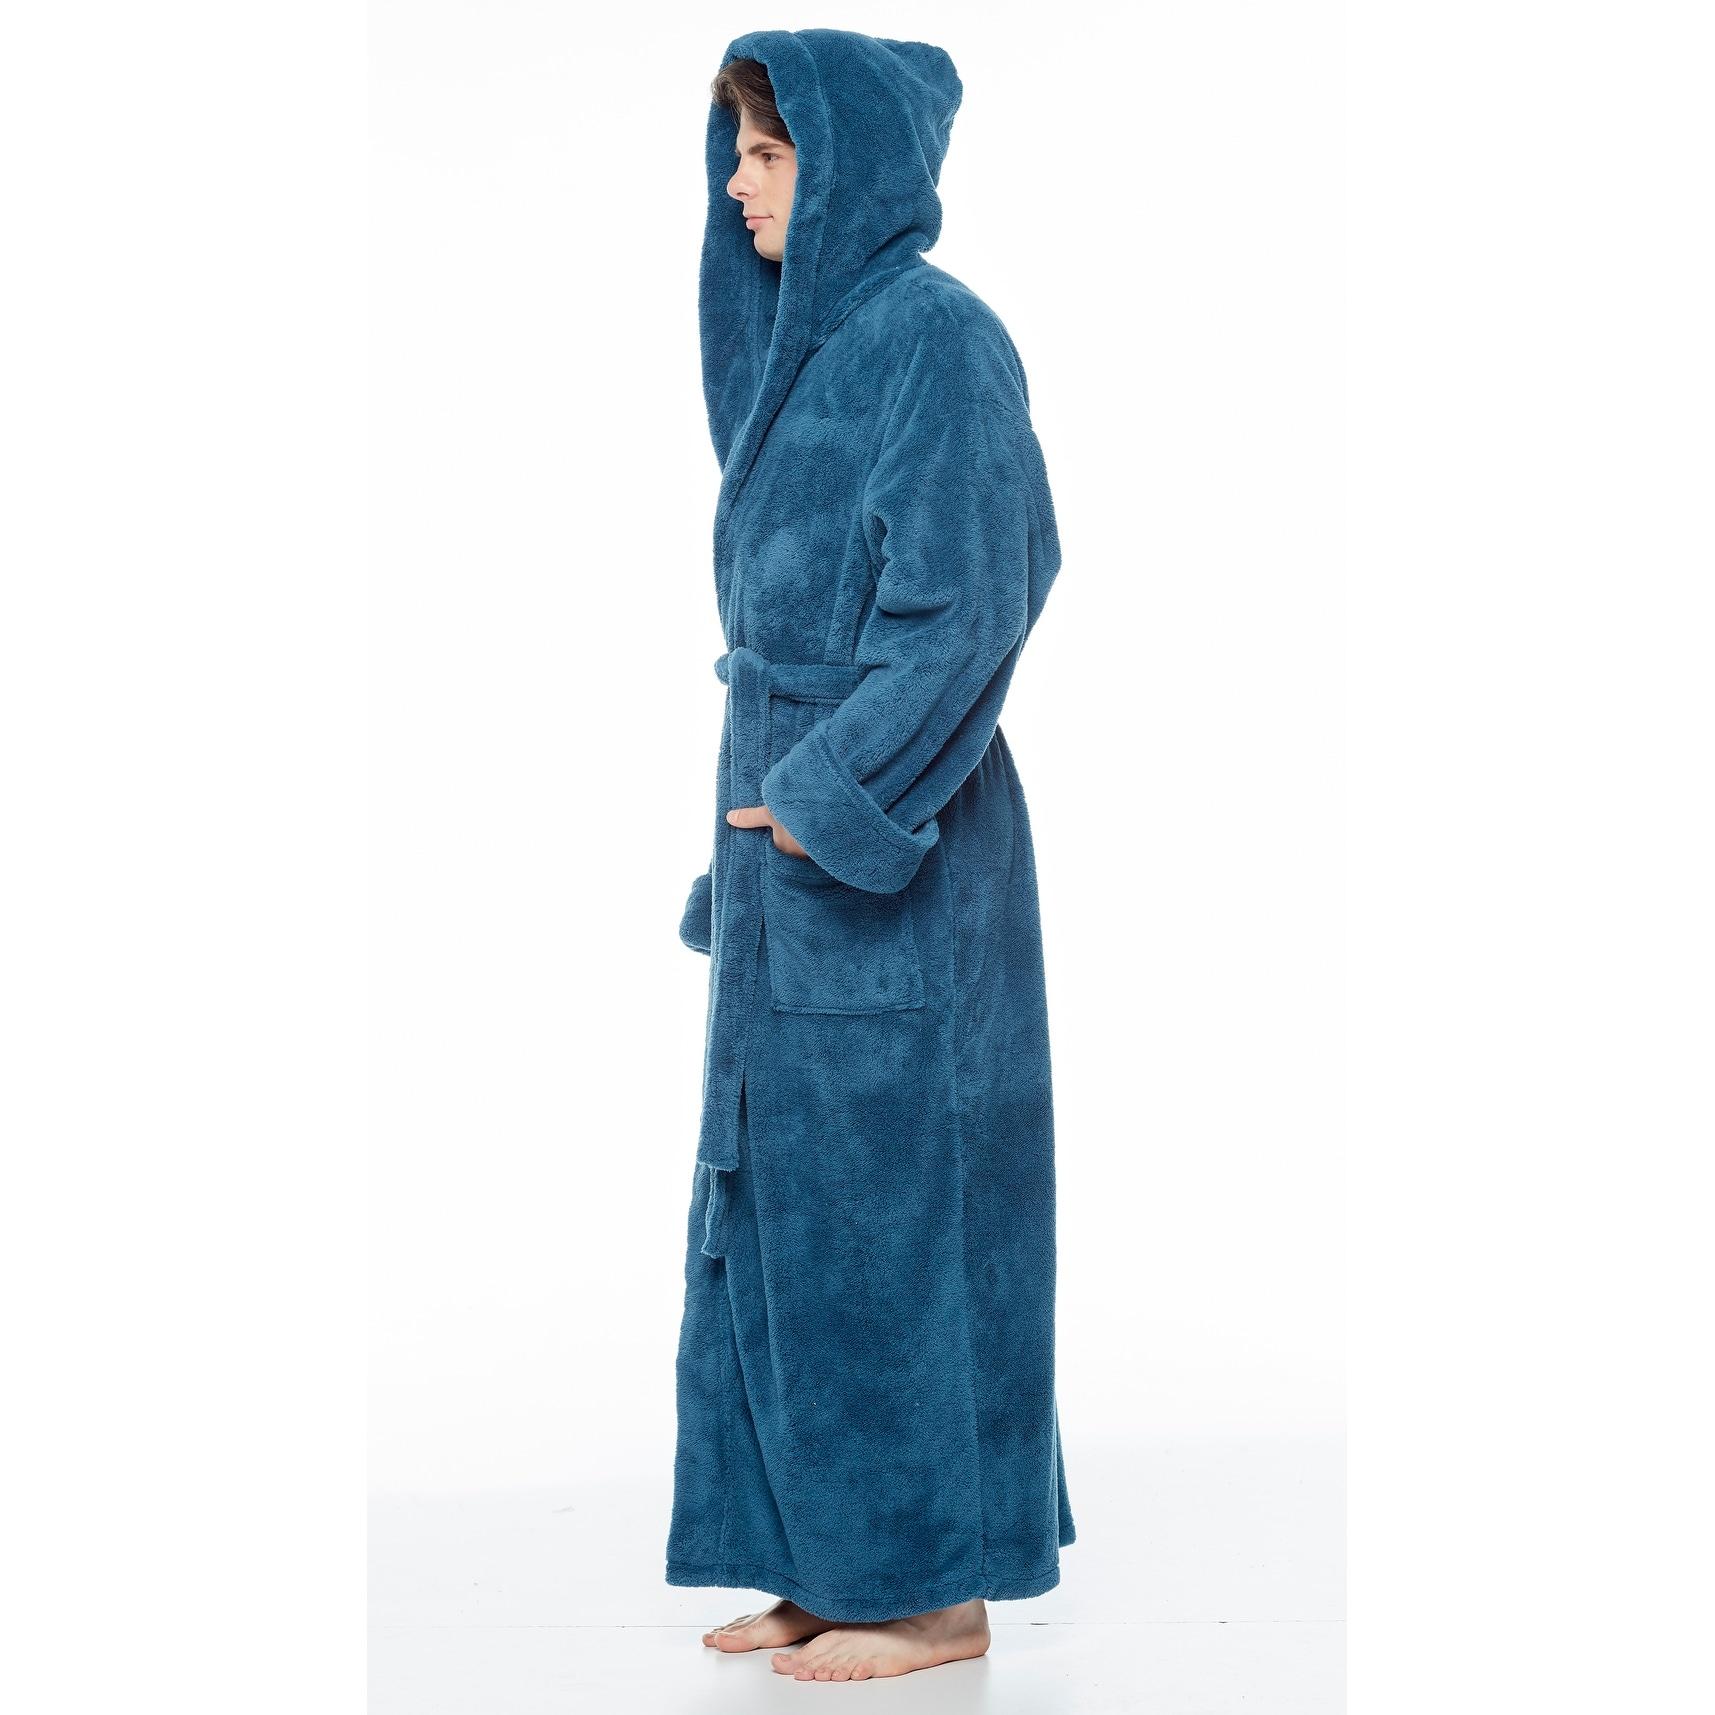 Mens Big and Tall Hooded Robe S-5XL Fleece Plush Kimono Bathrobes Velour Nightgown Spa Shawl Bathrobe Robes